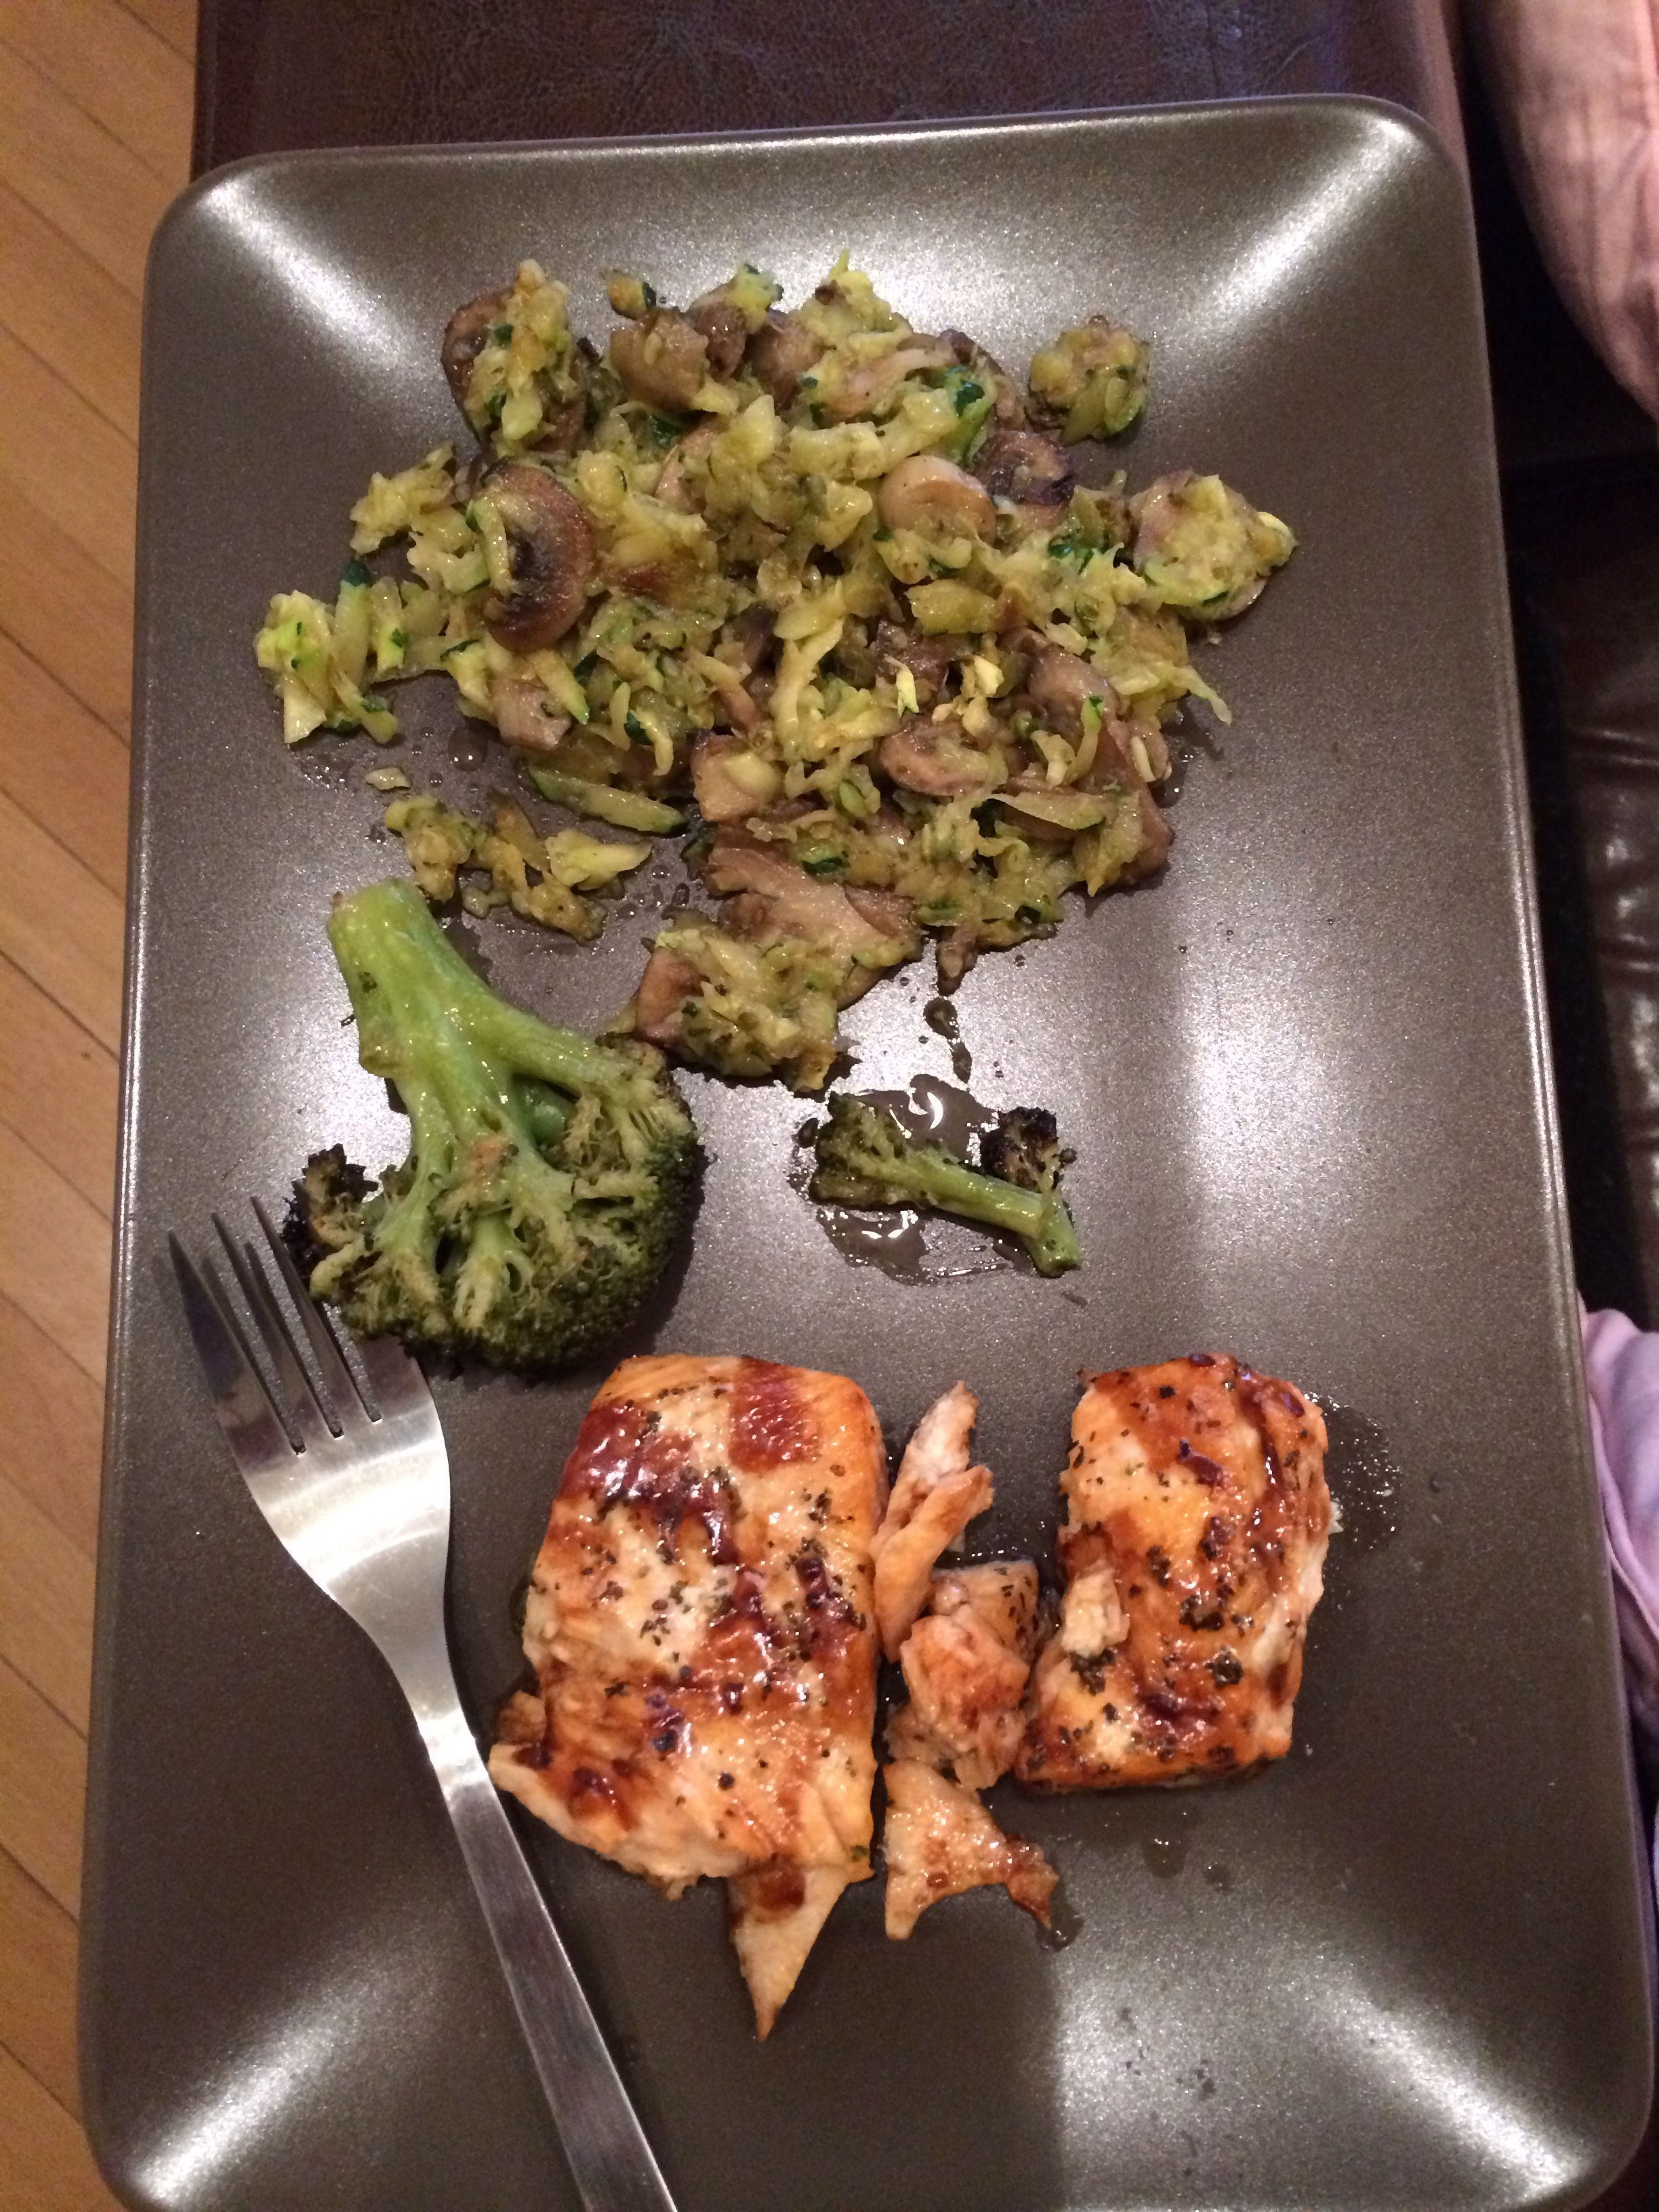 Salmon with teriyaki sauce, brocolli, mushrooms and zucchini  Healthy and nutrient meal